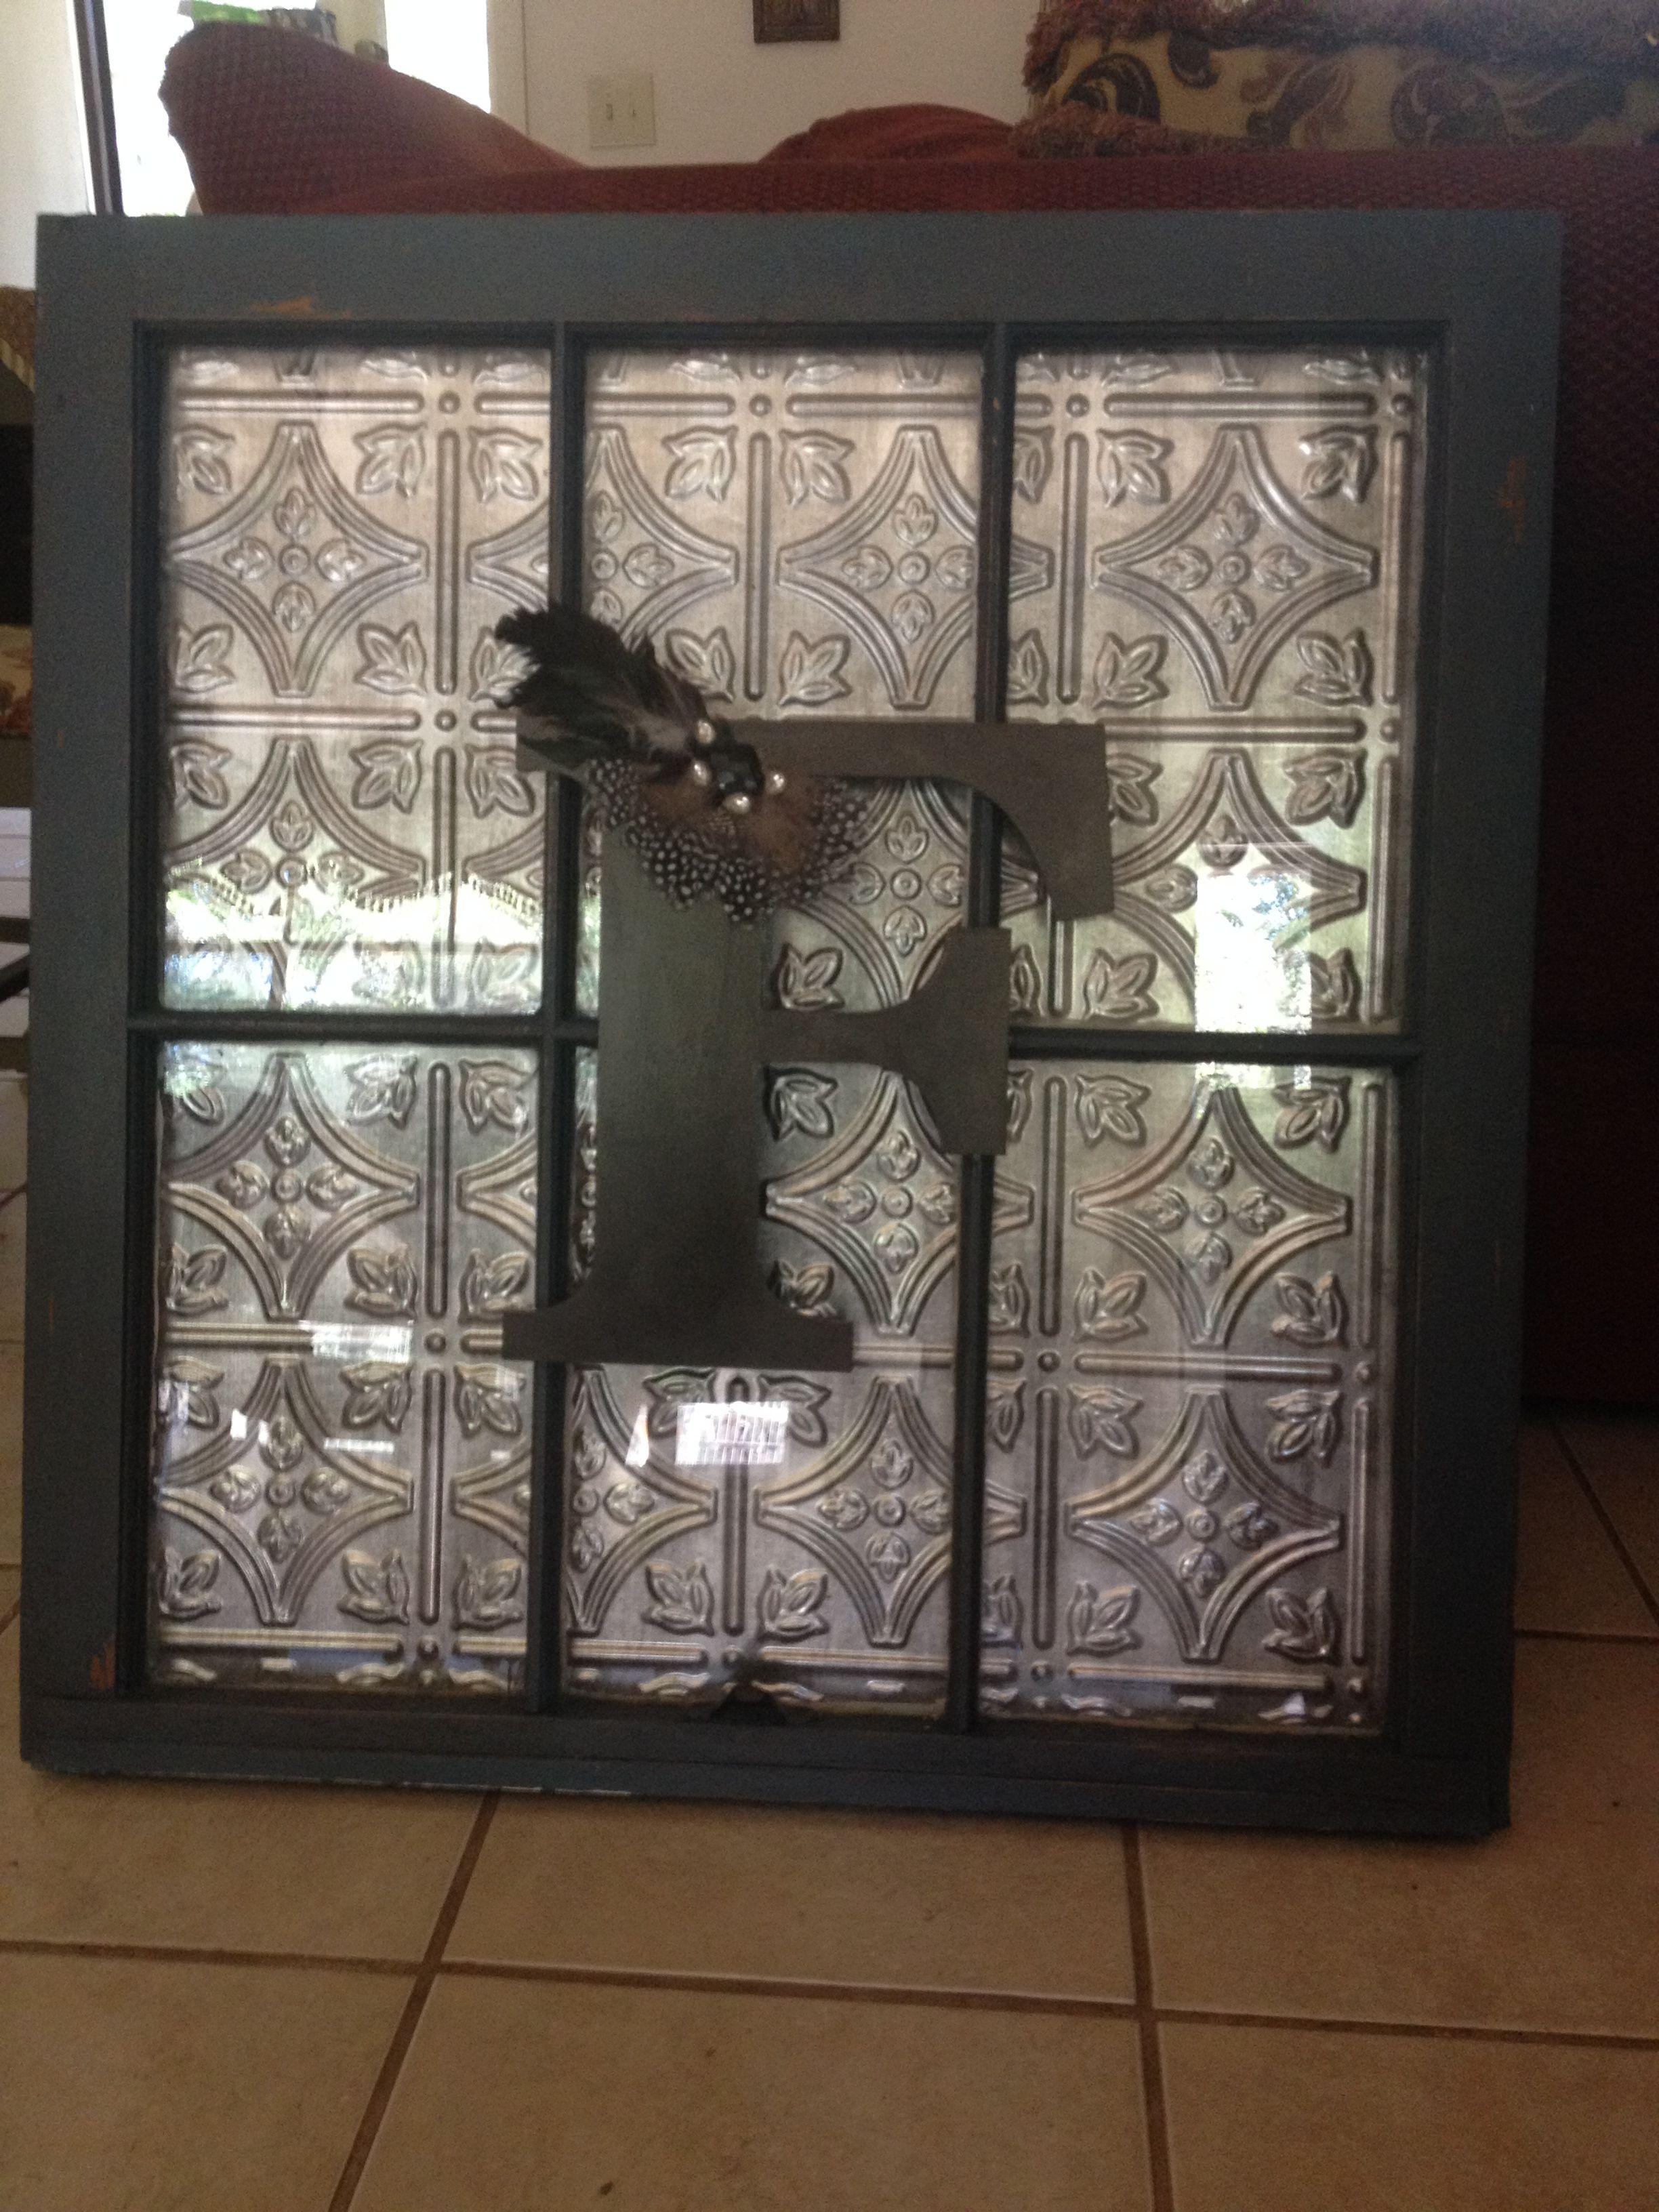 Window pane ideas  old window idea  repurposed windows  pinterest  casitas hogar